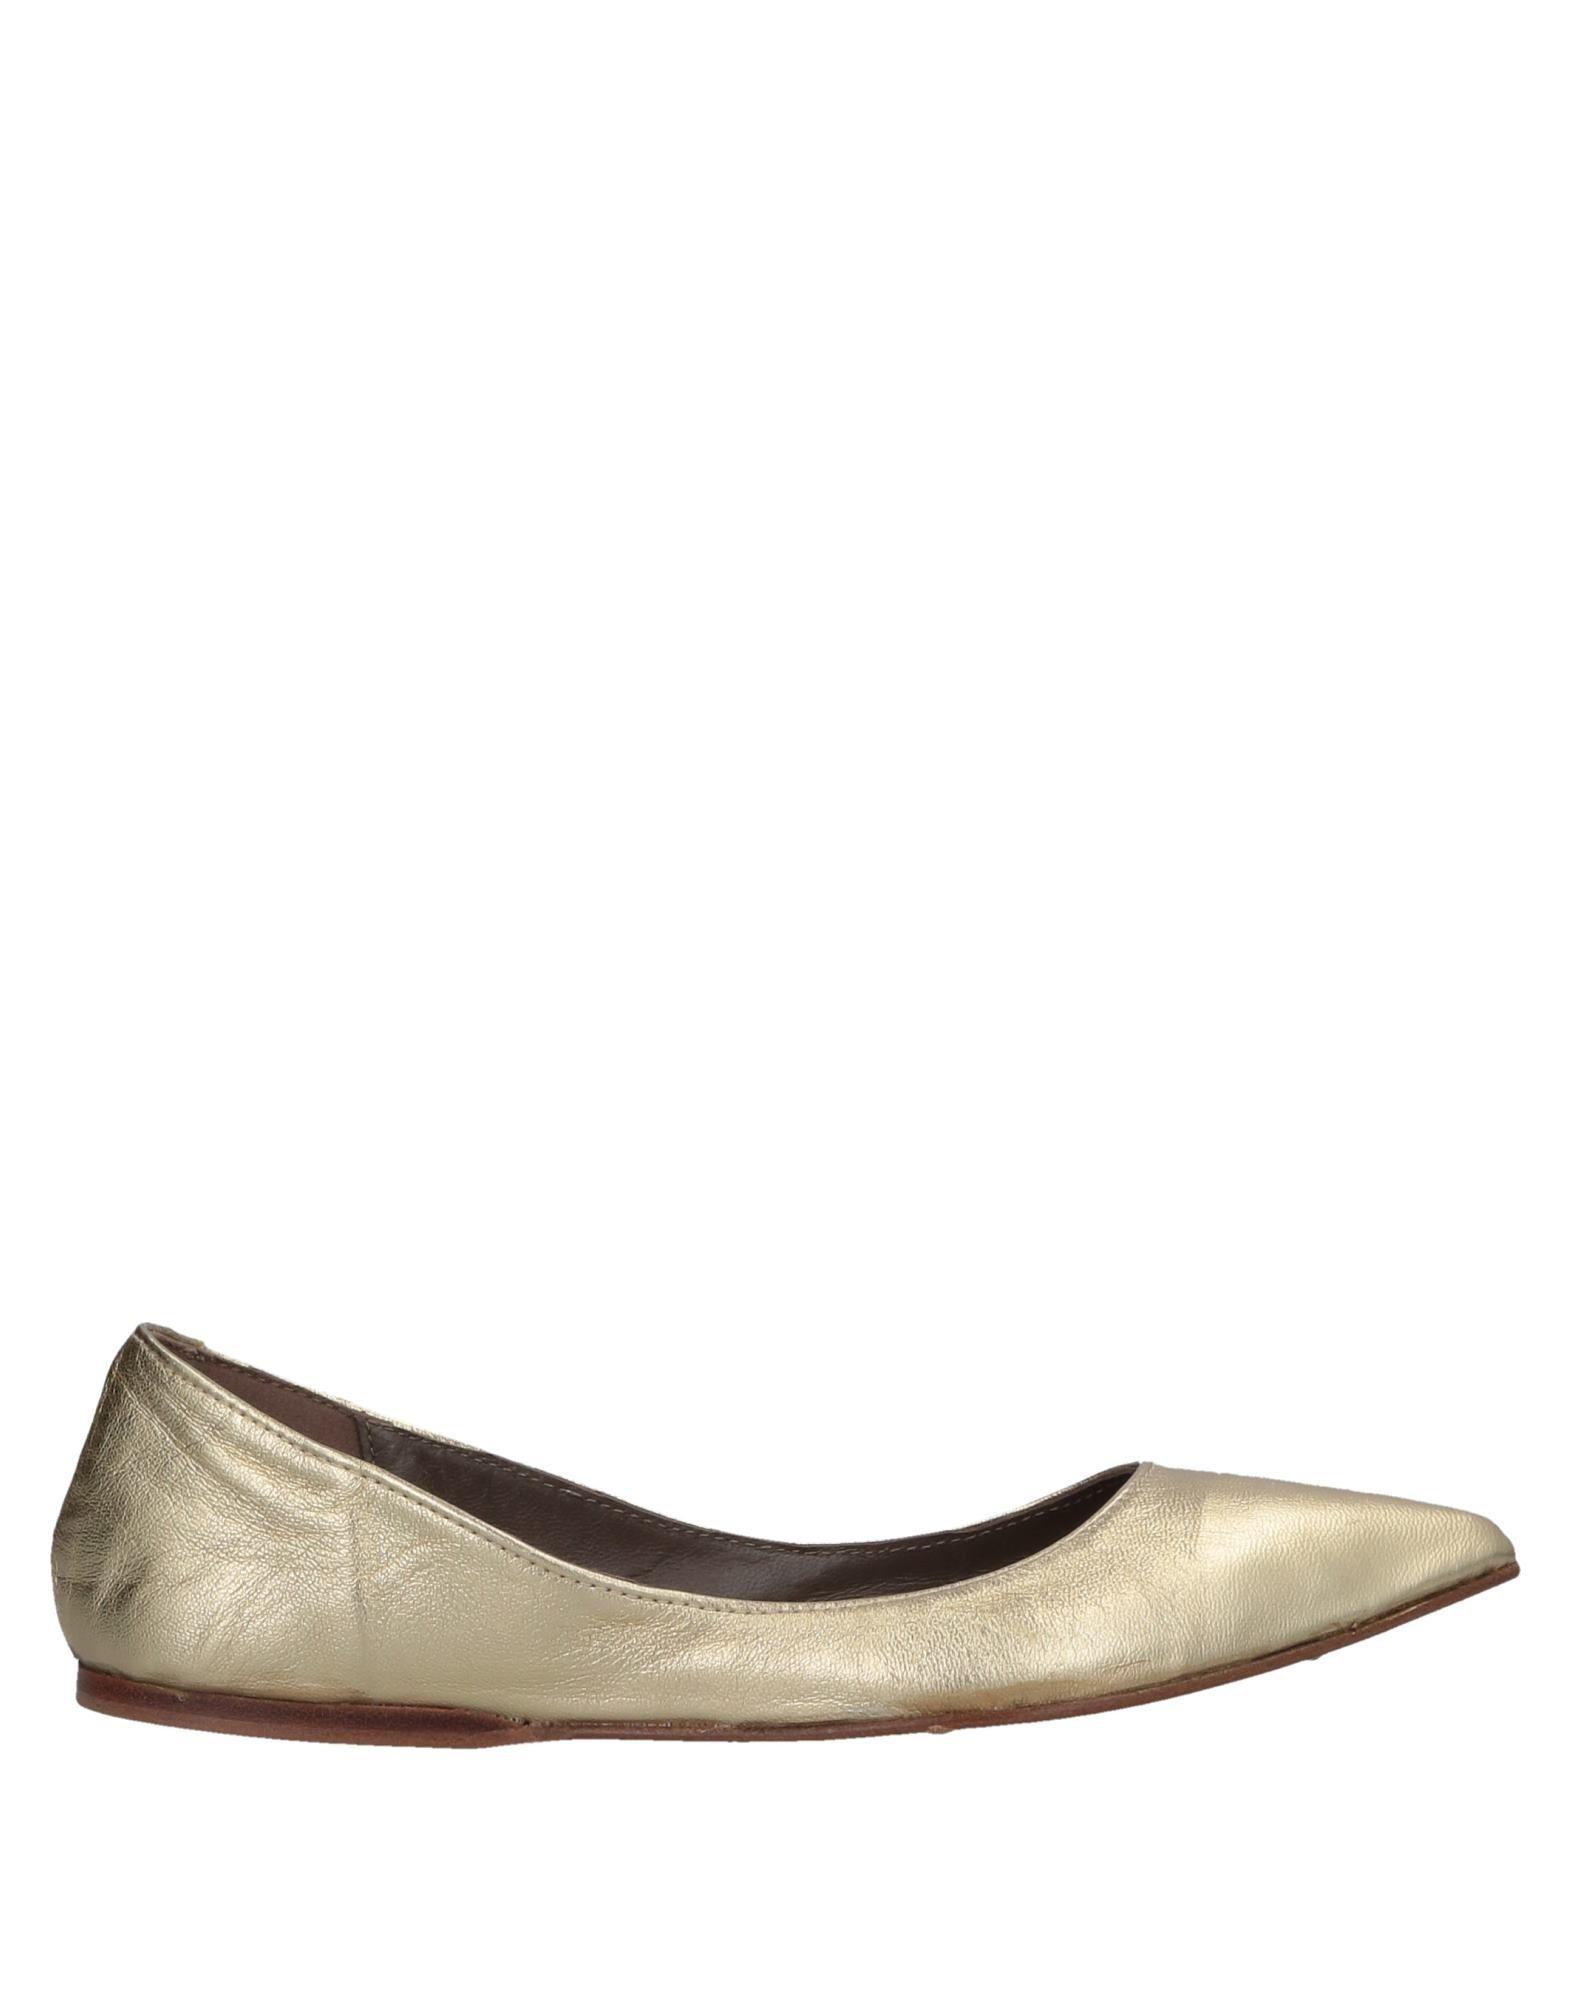 M&P Maypol Ballet Flats - Women M&P Maypol Ballet Australia Flats online on  Australia Ballet - 11531603MV 01e756